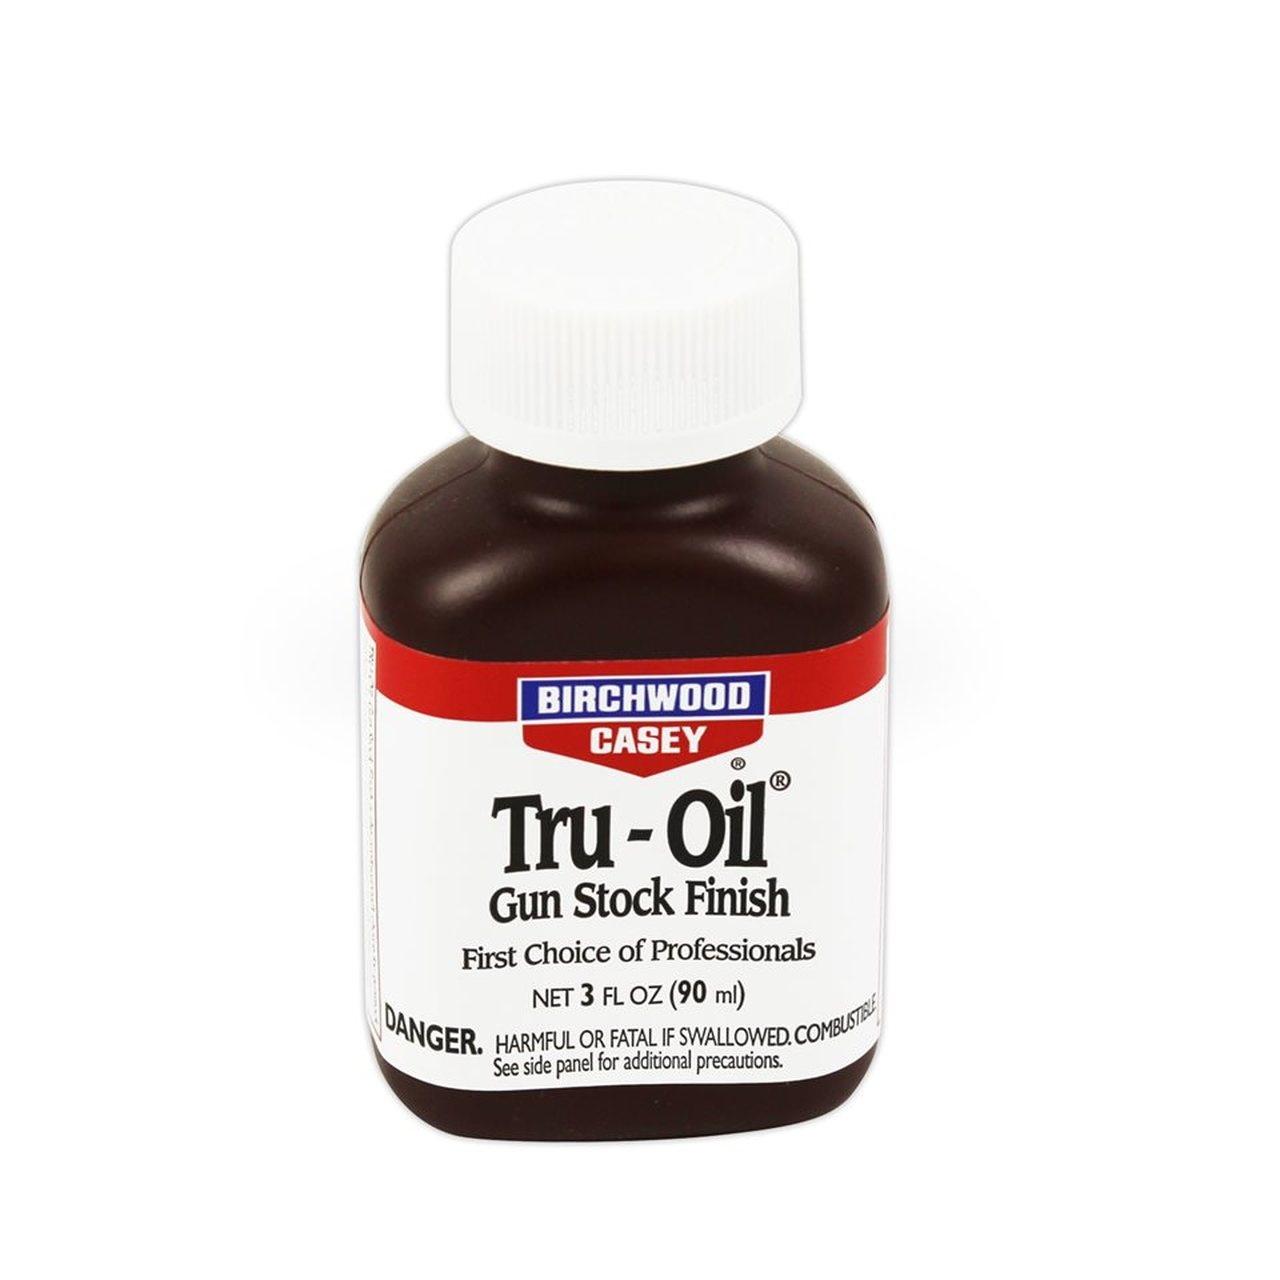 Birchwood Casey Birchwood Casey Tru-Oil Gun Stock Finish 3 FL Oz